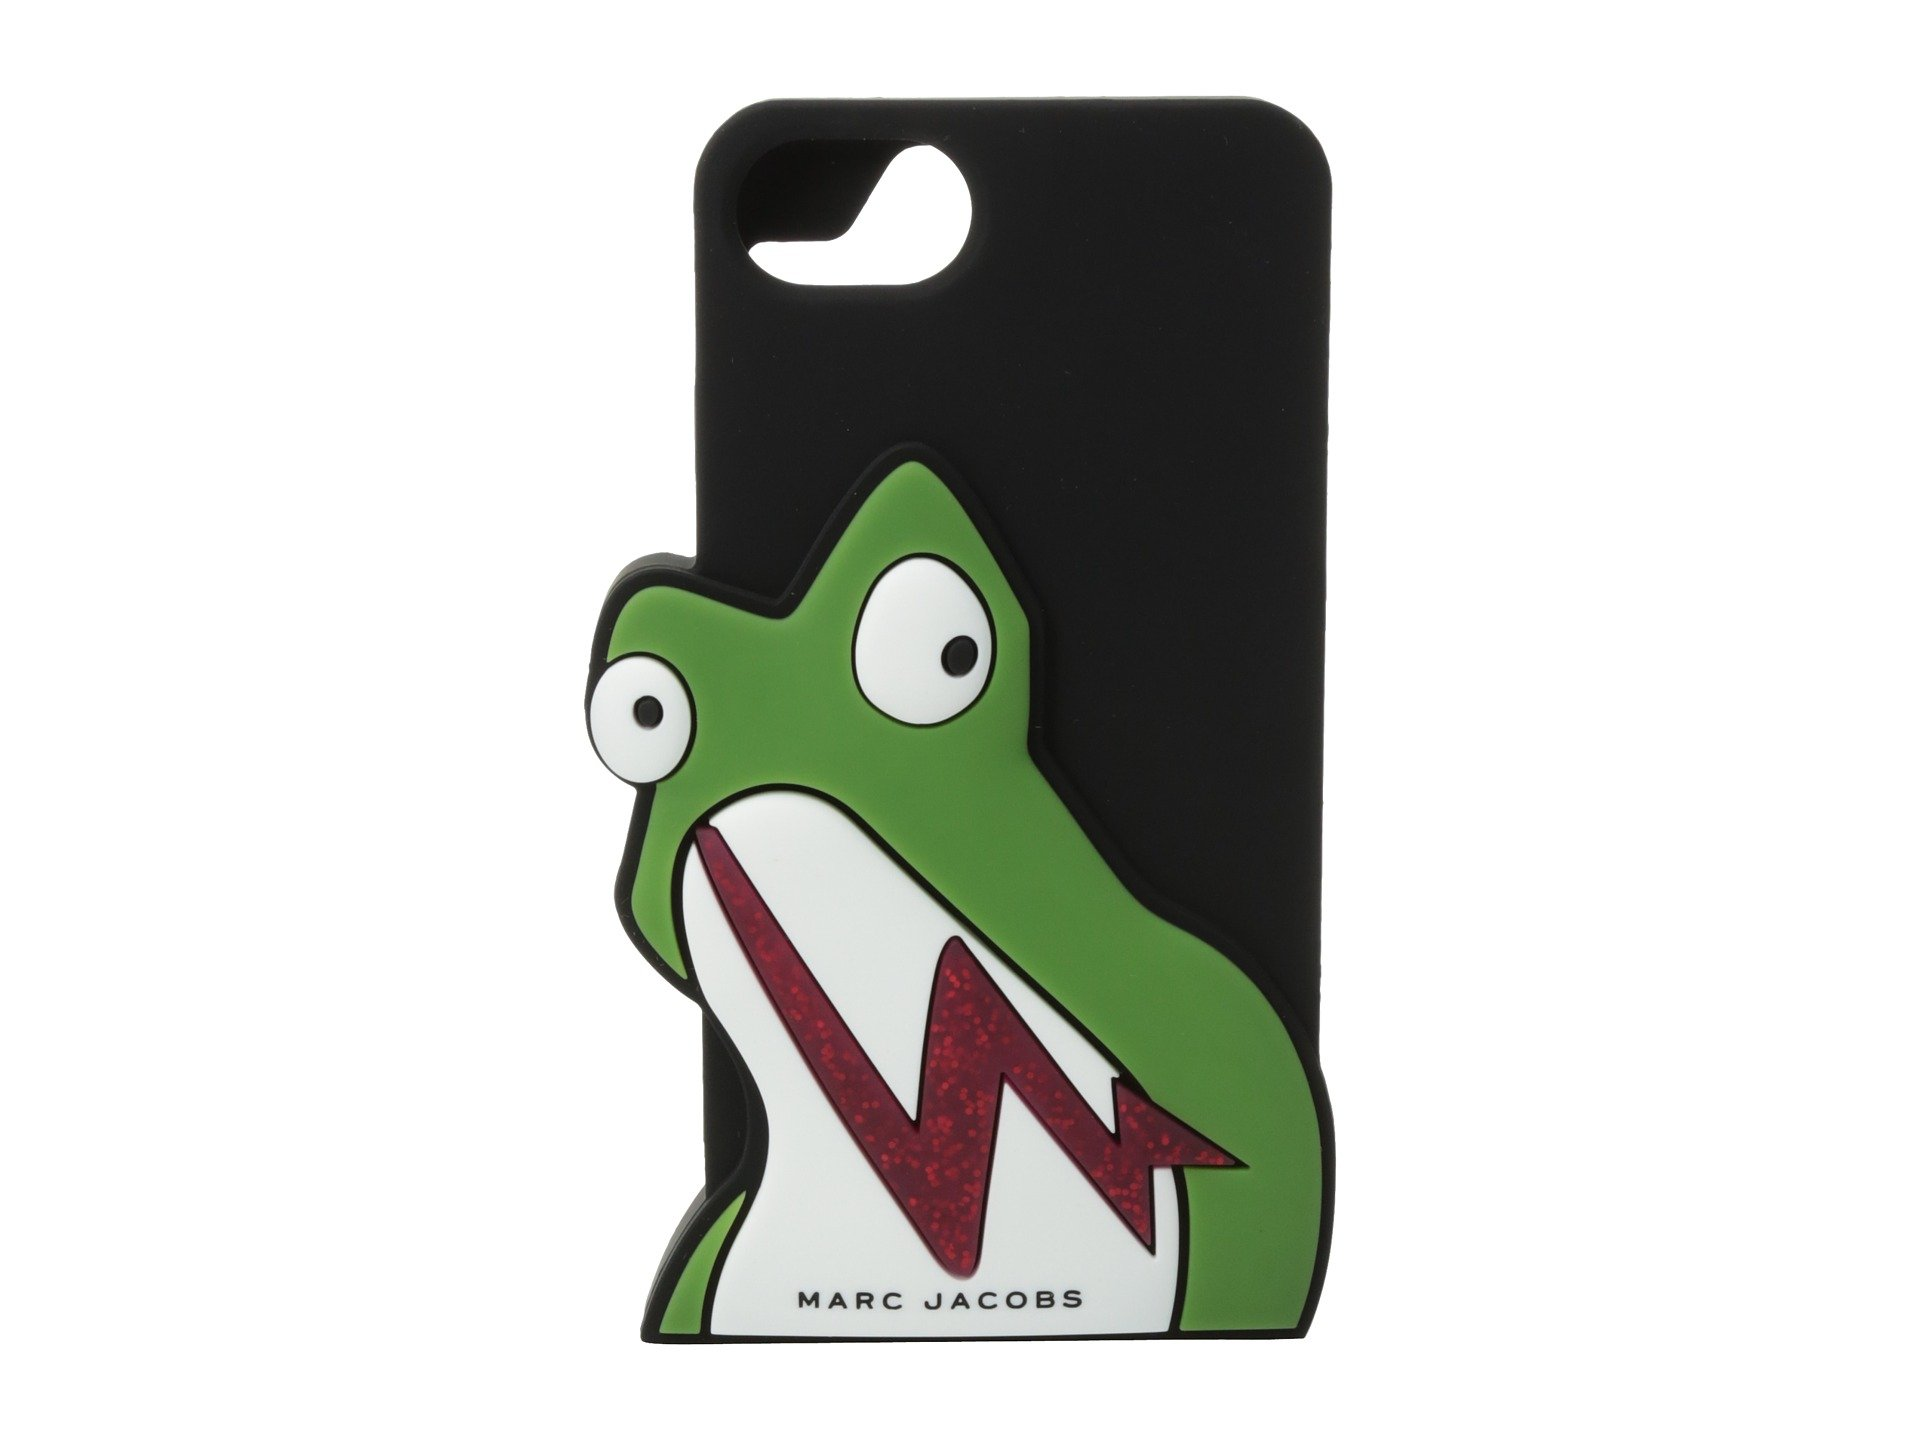 Accesorio para el Celular Marc Jacobs Frog Julie Vehoeven iphone 7 Case  + Marc Jacobs en VeoyCompro.net